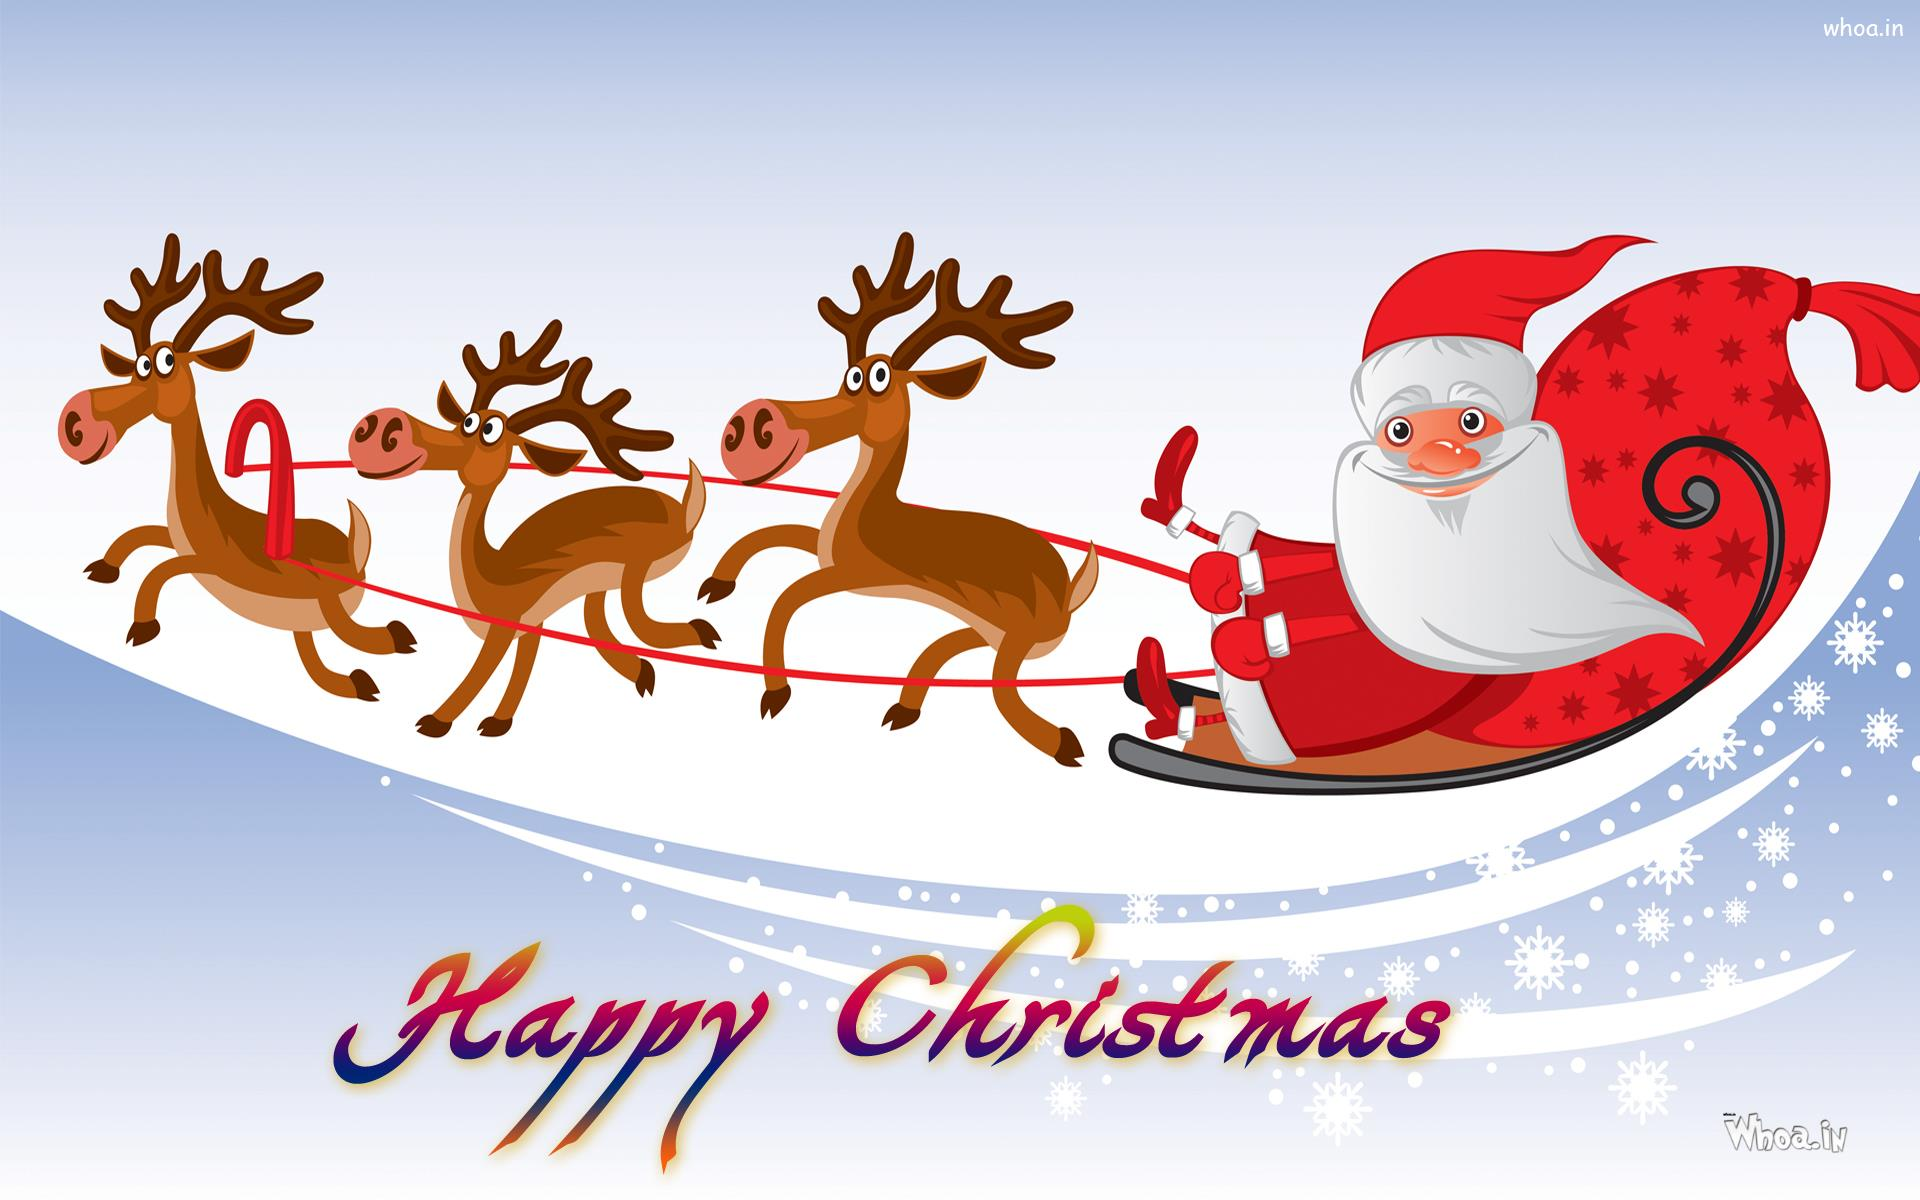 merry christmas greetings cartoon wallpaper